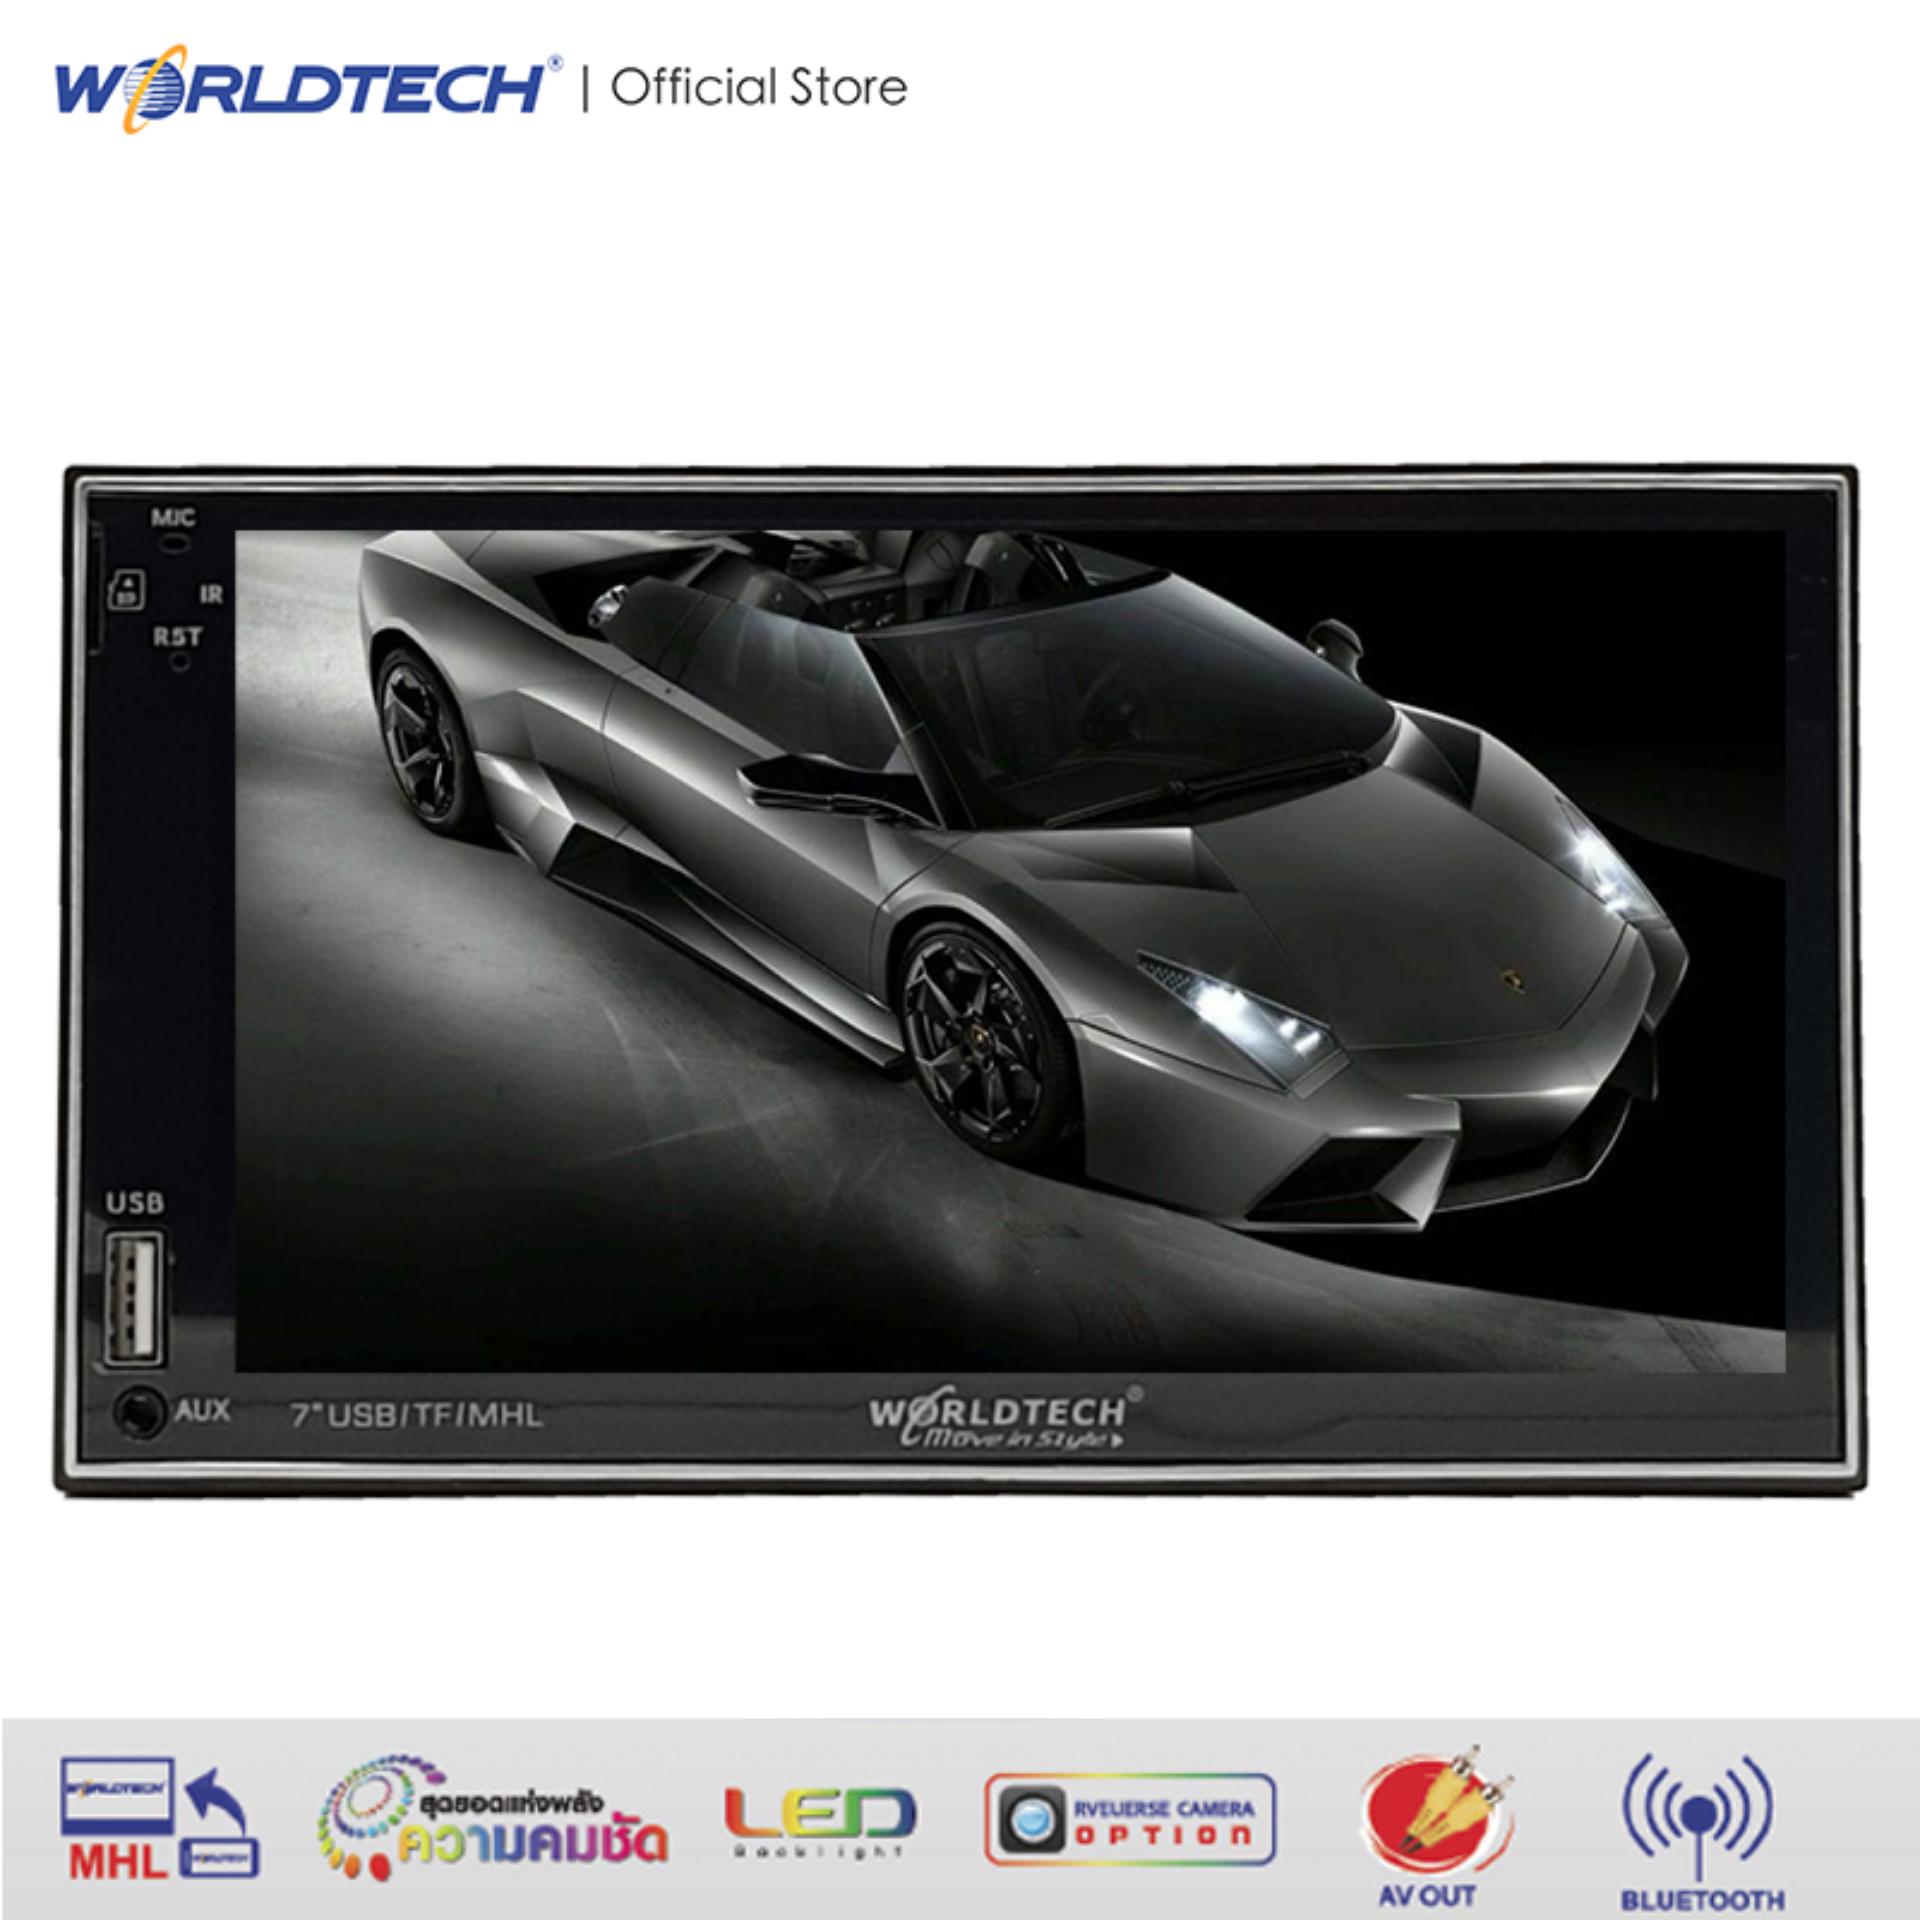 Worldtech รุ่น Wt-55ddckbt-19 เครื่องเสียงรถ,วิทยุติดรถยนต์ 2din 7 นิ้ว Mirror Link , Android และ Ios (วิทยุ Mp3 Usb บลูทูธ).